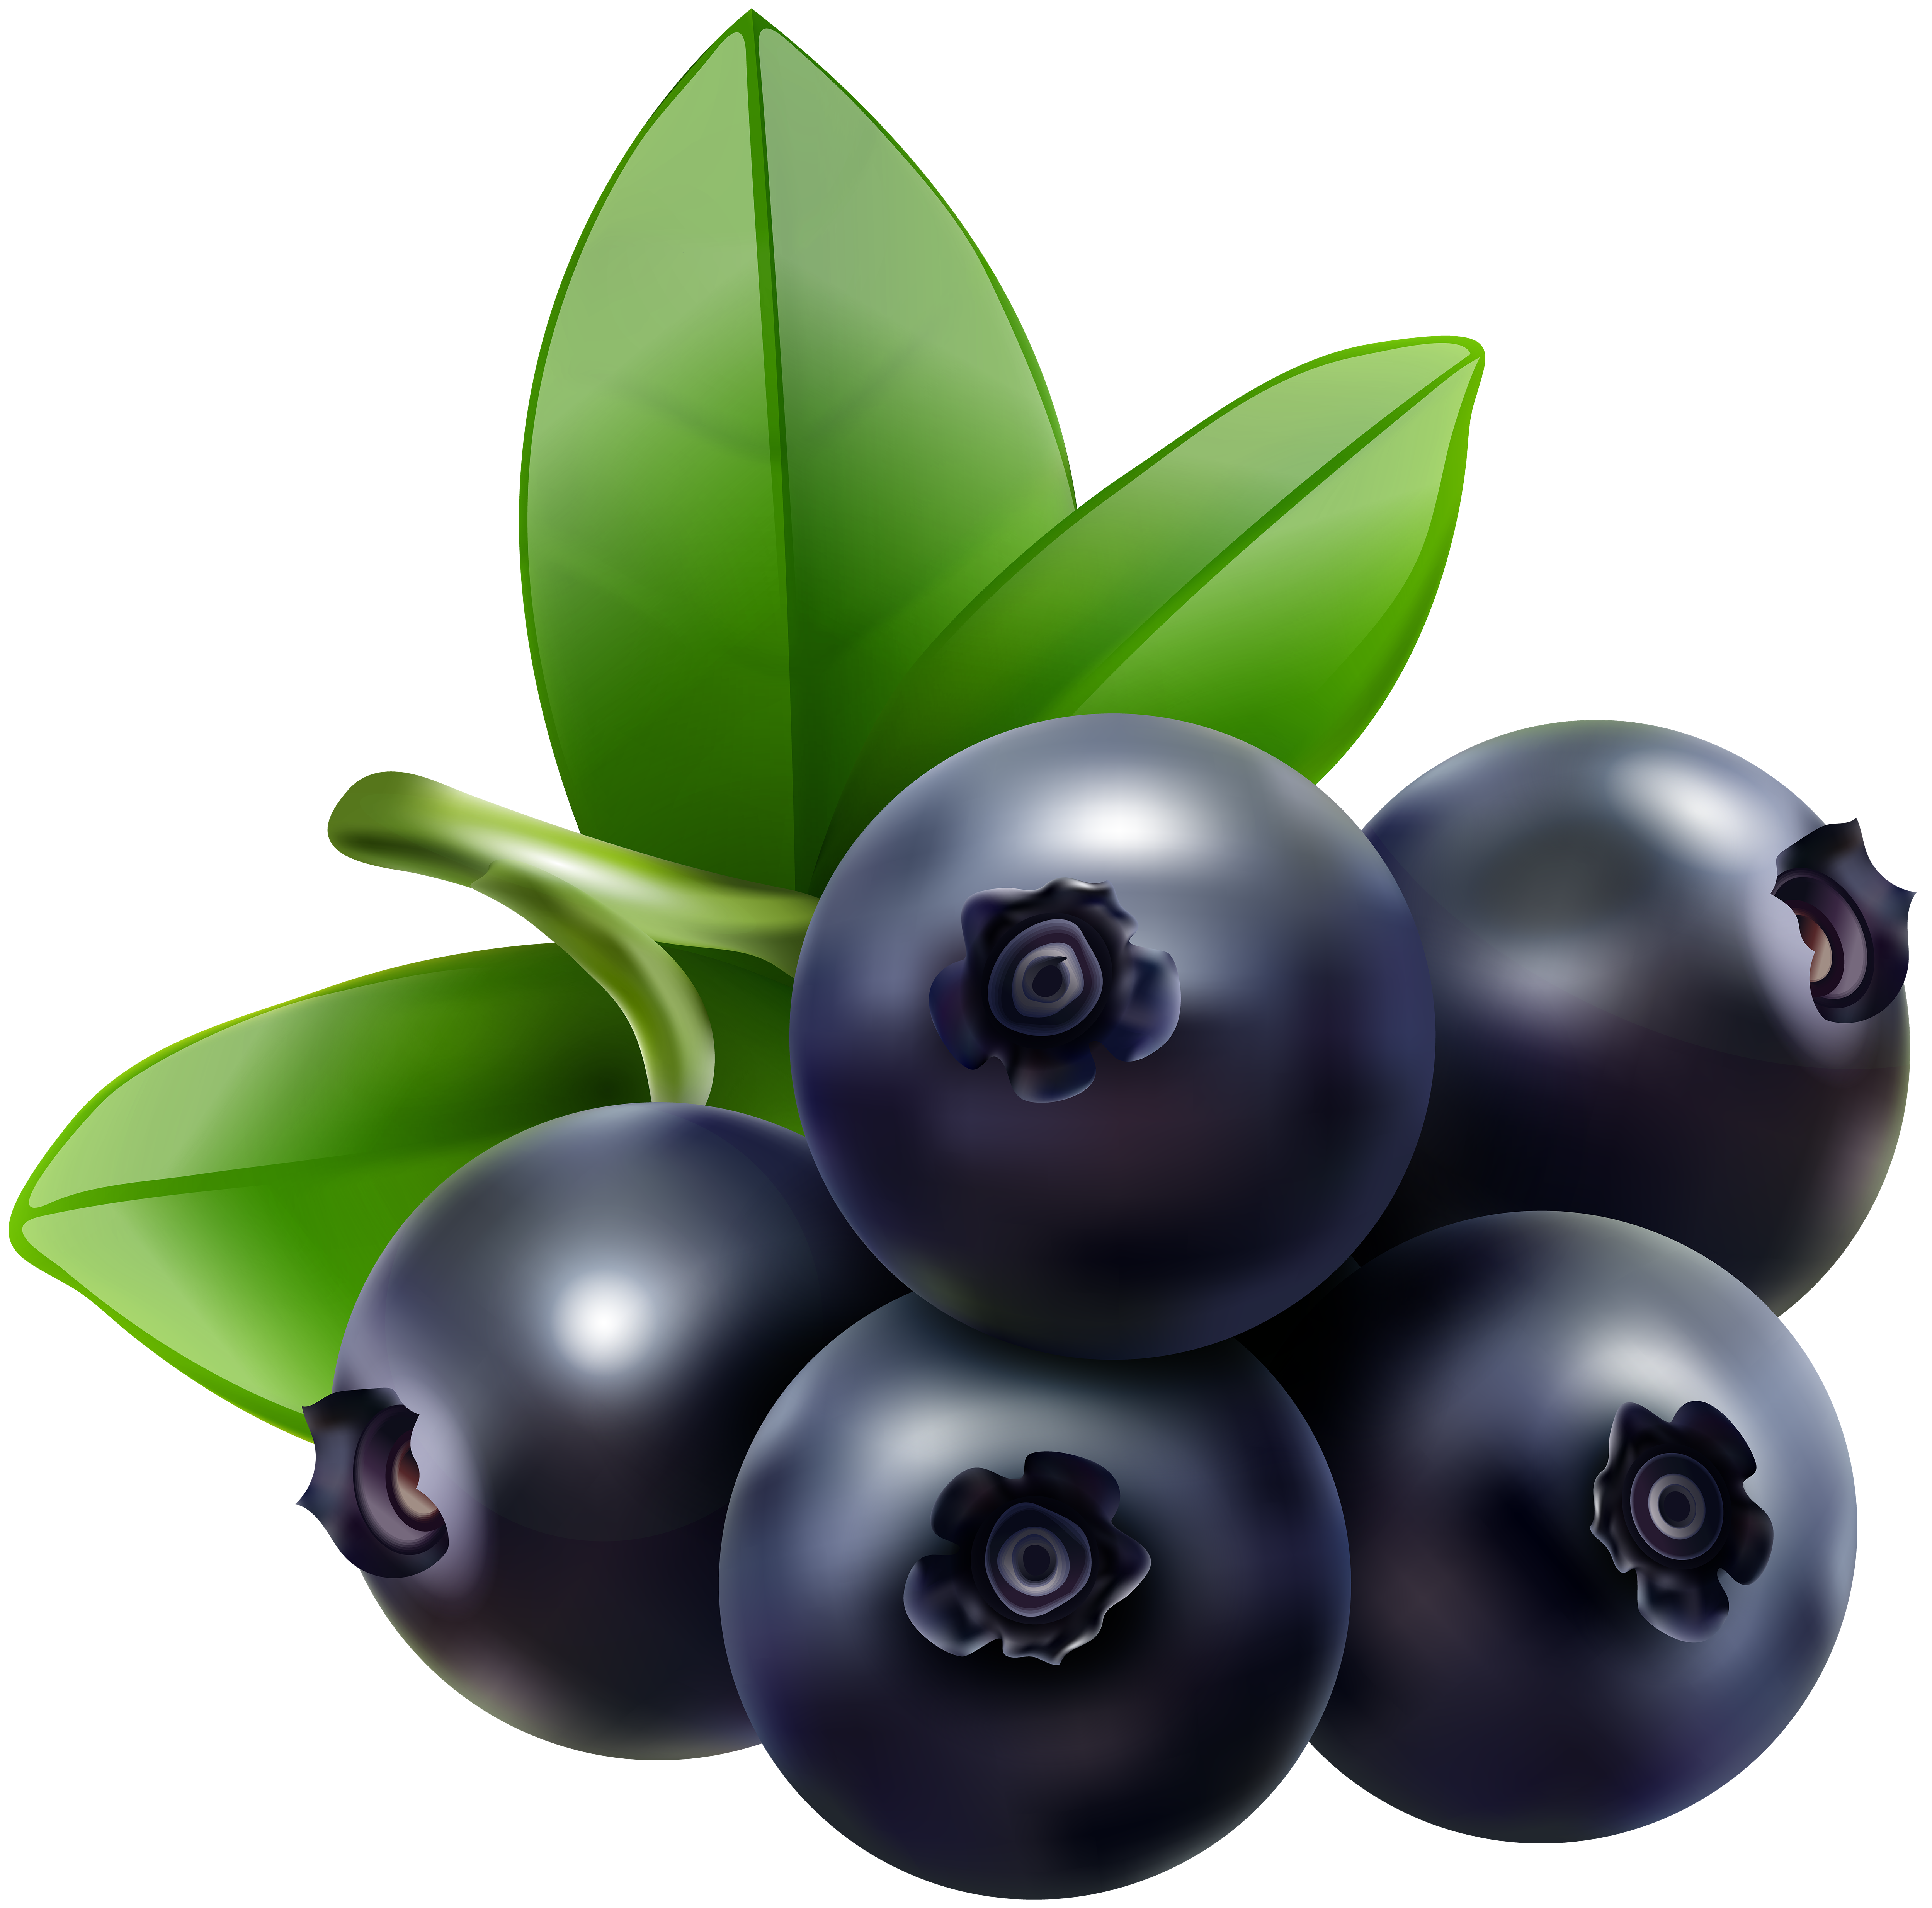 clip art freeuse stock Cherries clipart blueberry. Bilberry huckleberry clip art.